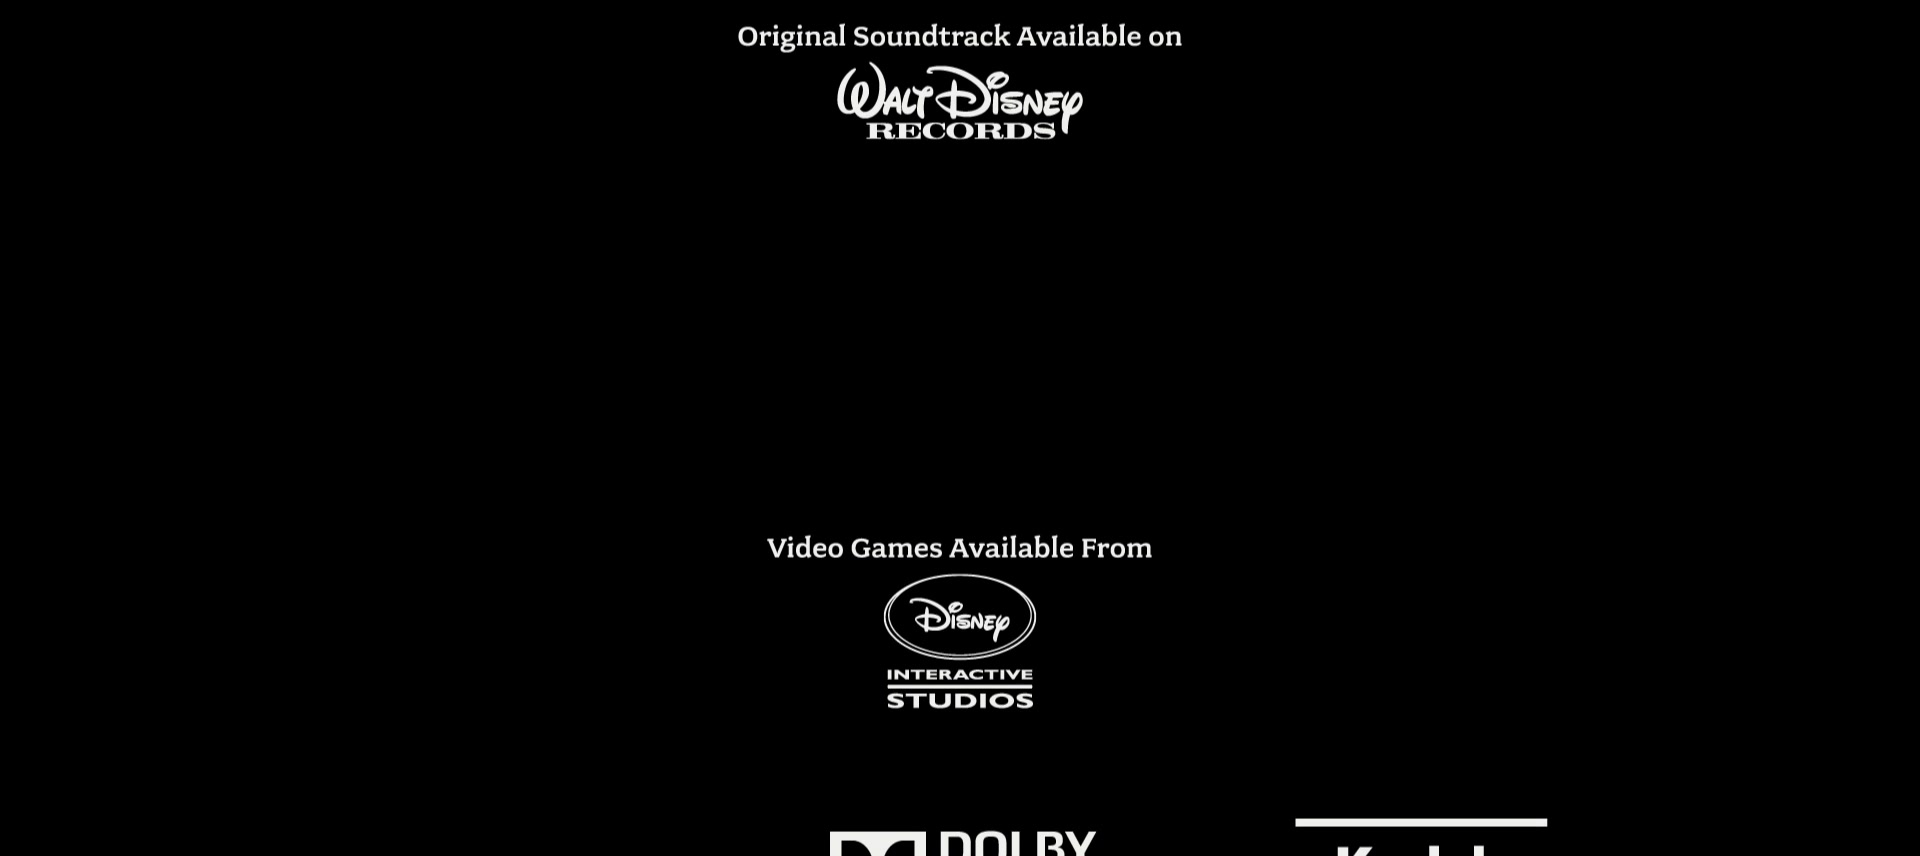 Disney Interactive Studios.